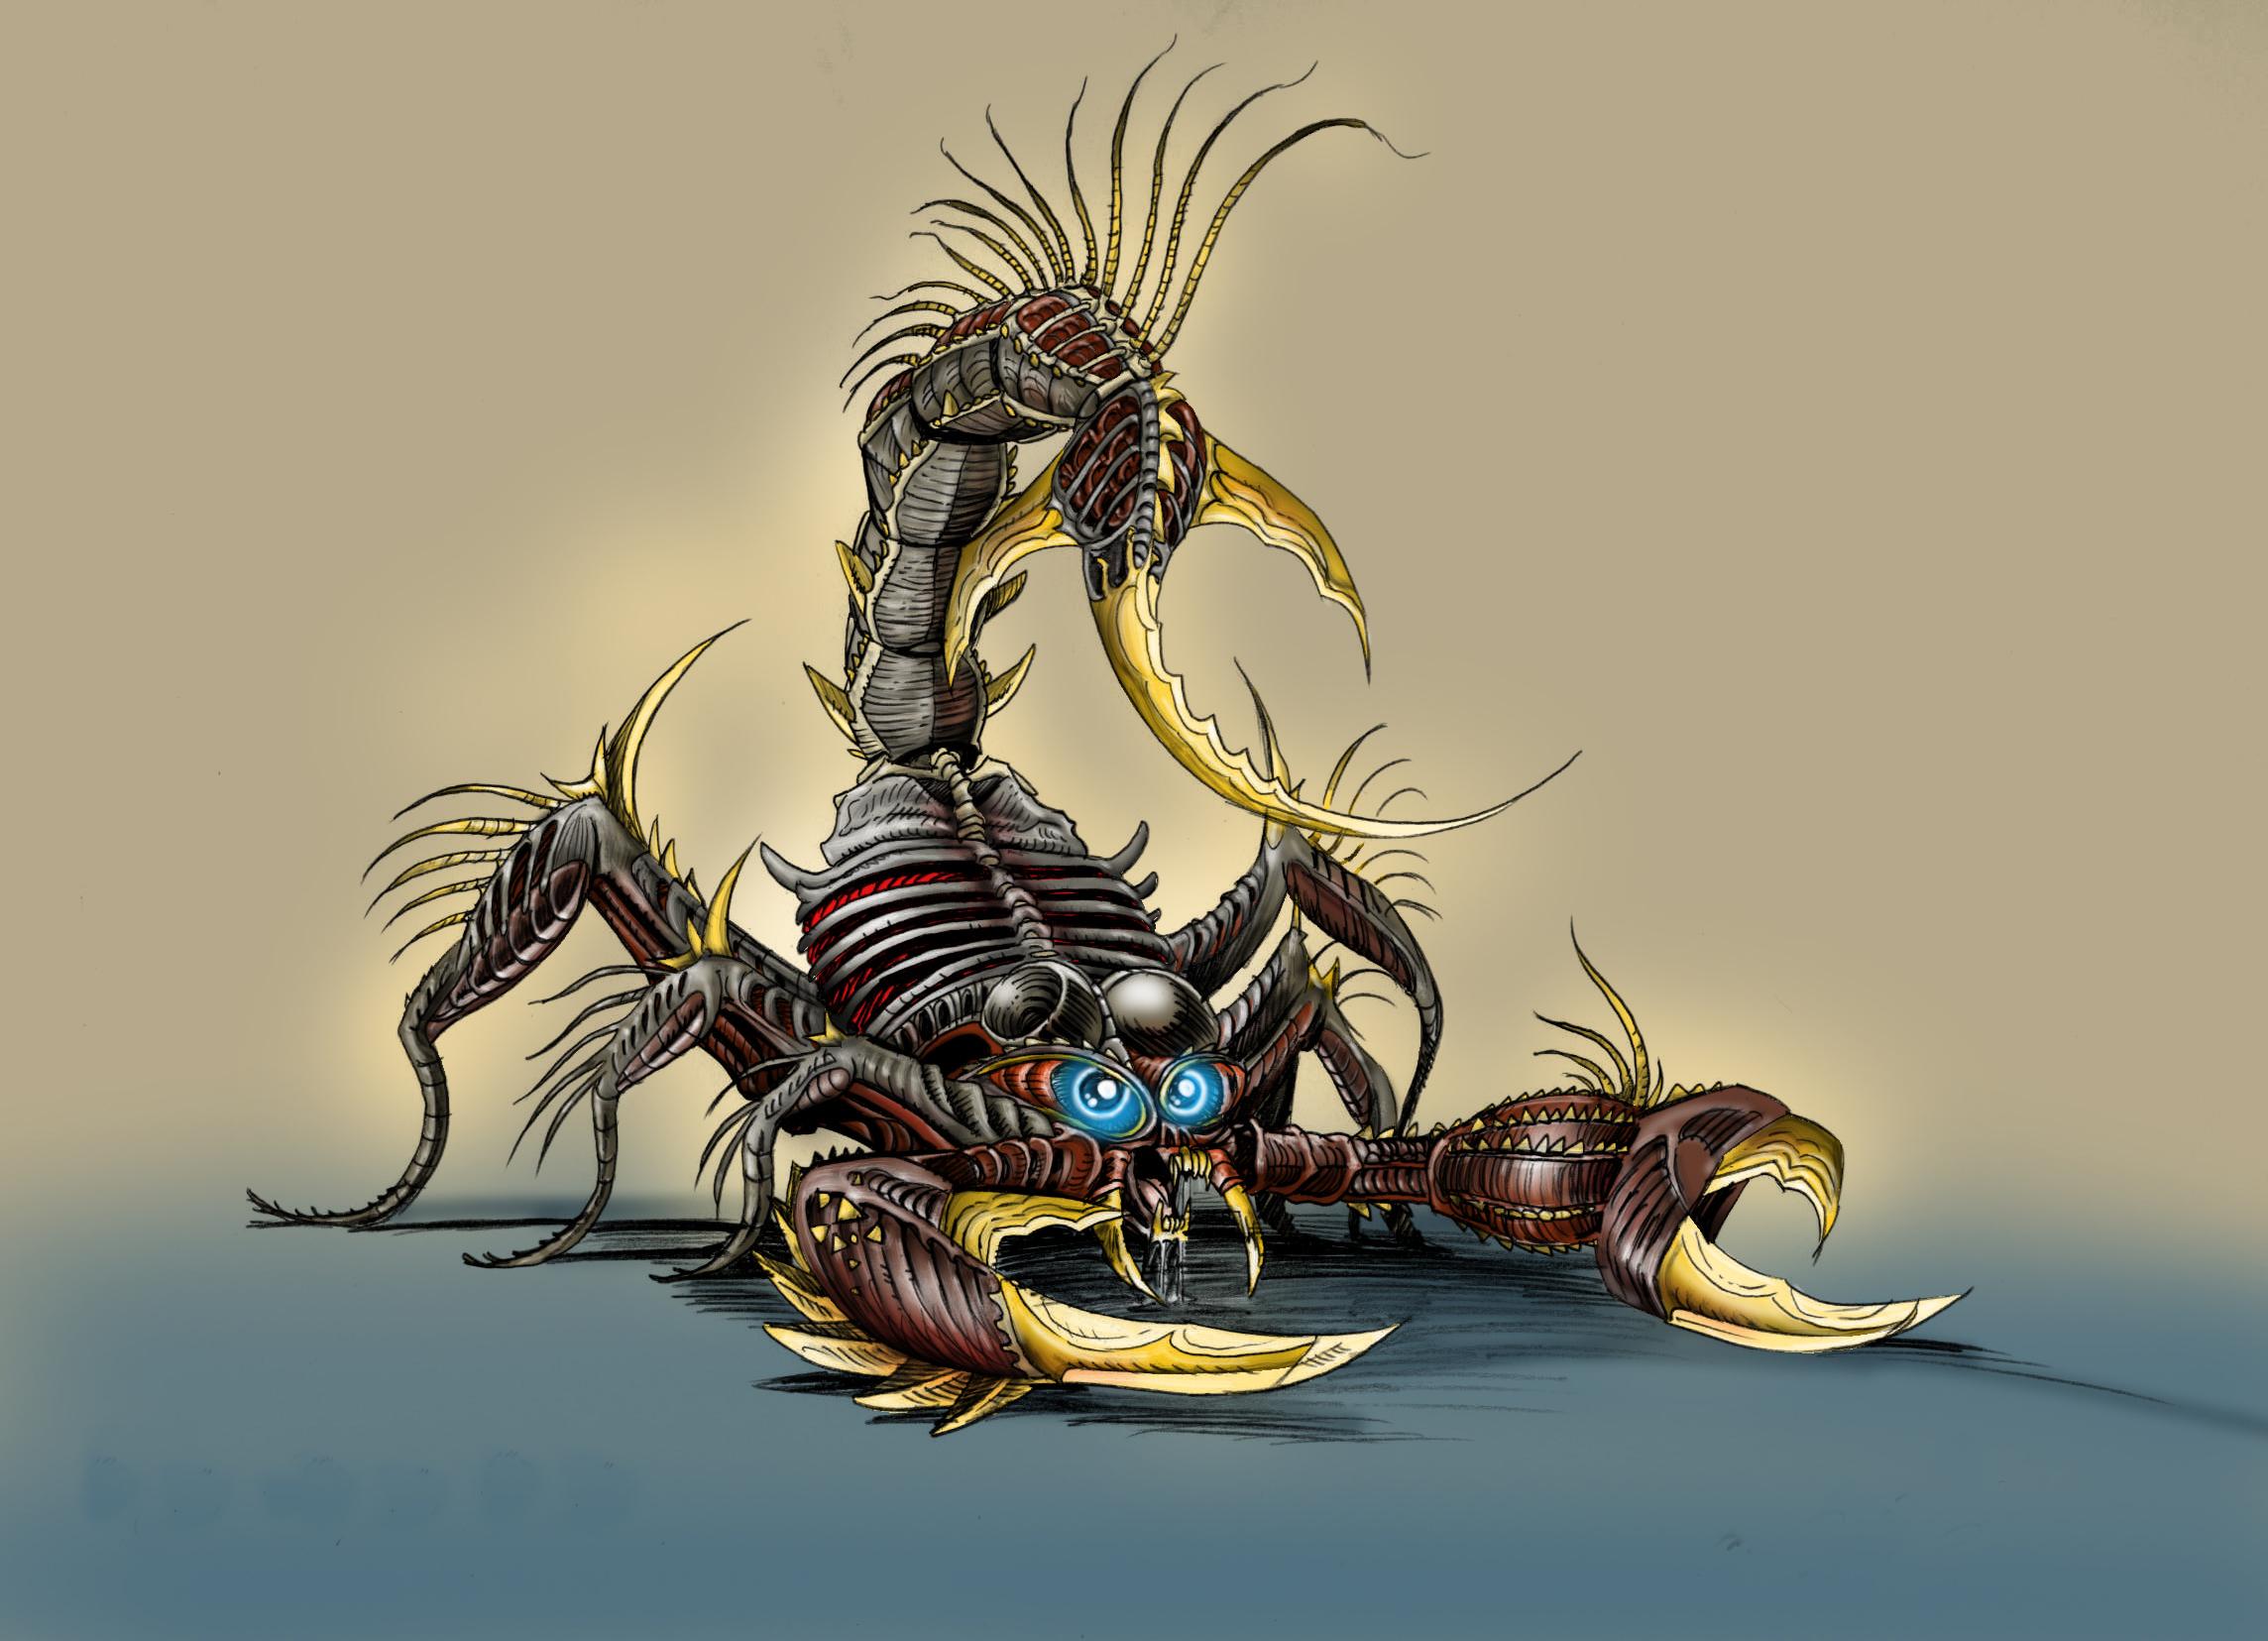 Scorpion Wallpapers 2288x1655